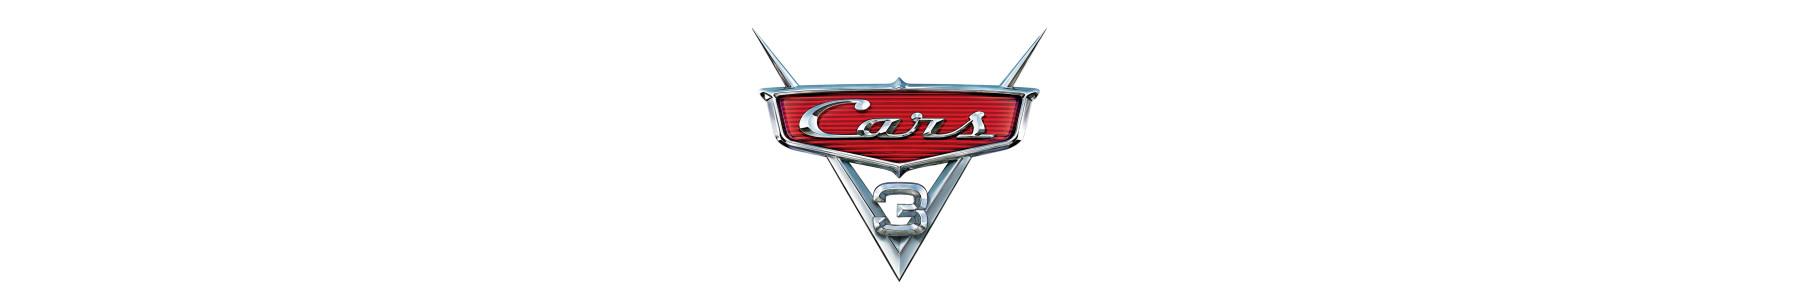 Articole party CARS 3